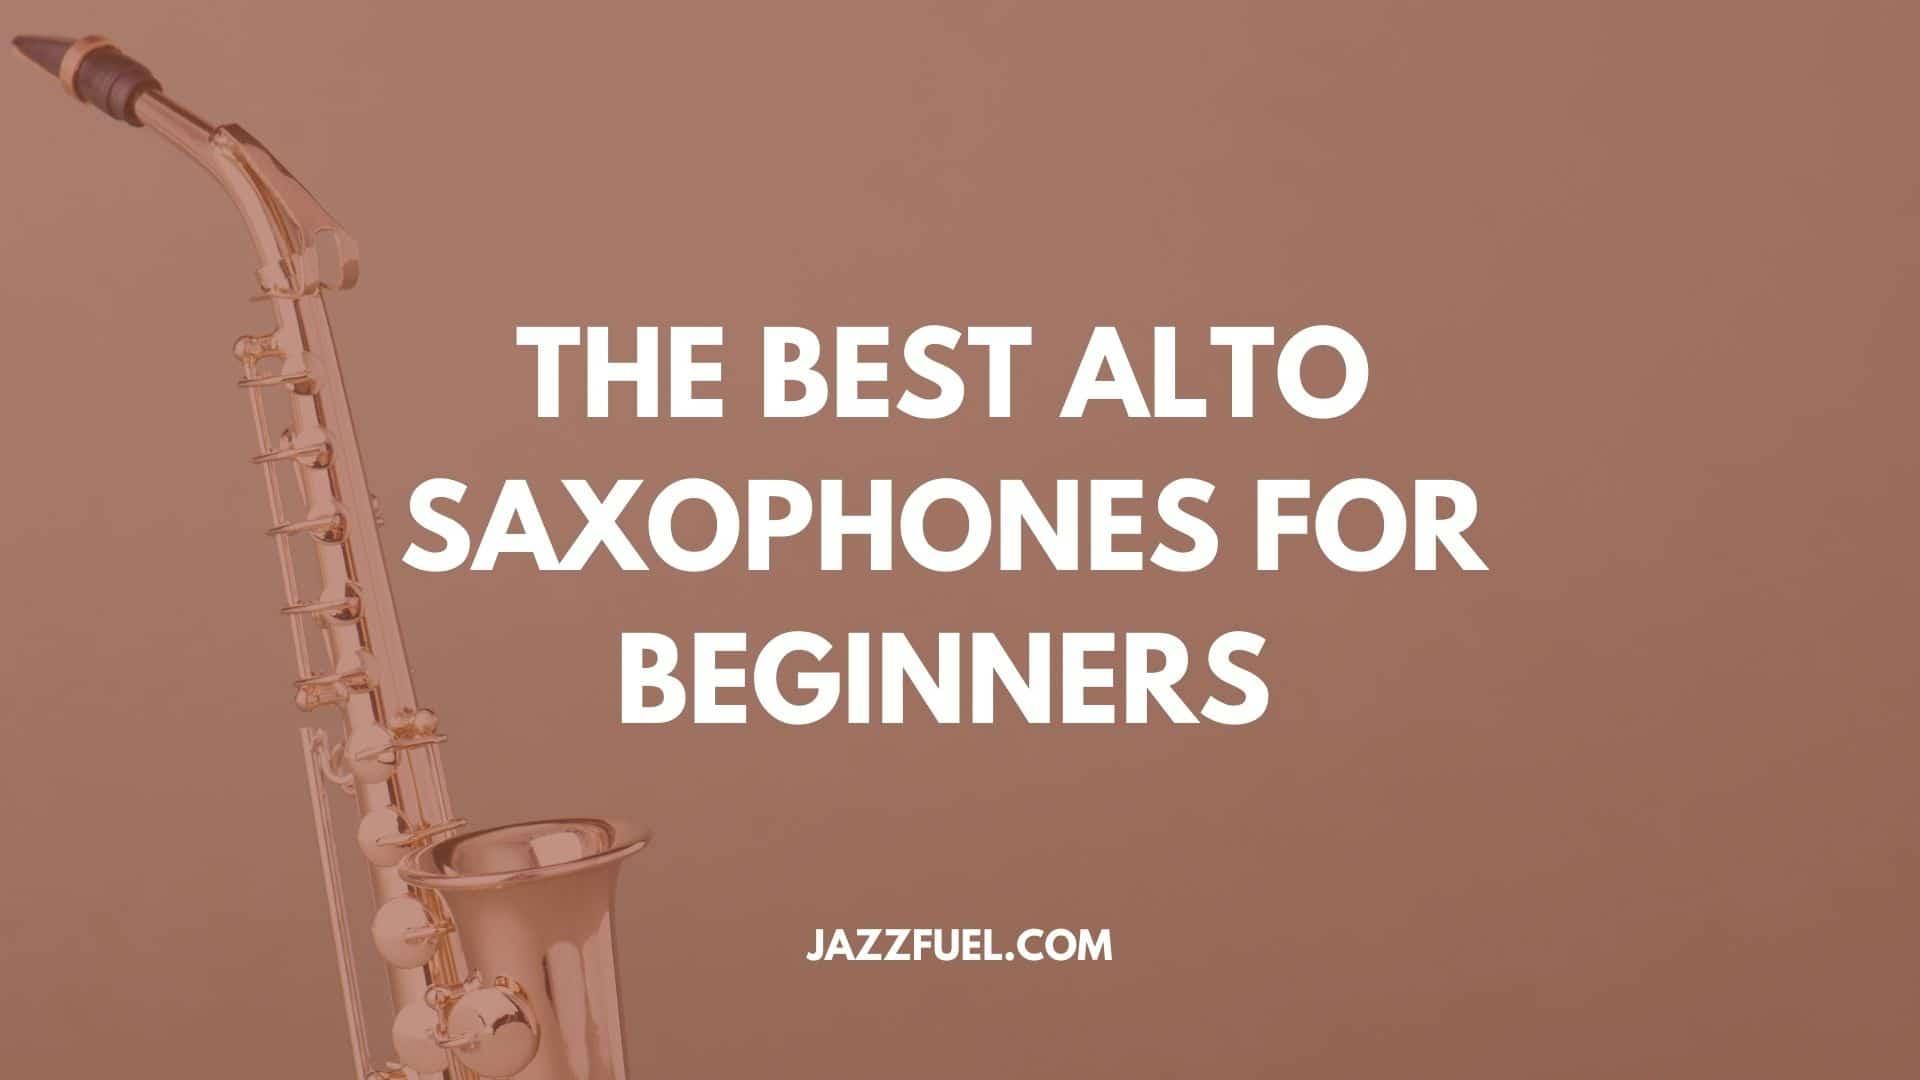 alto saxophones for beginners